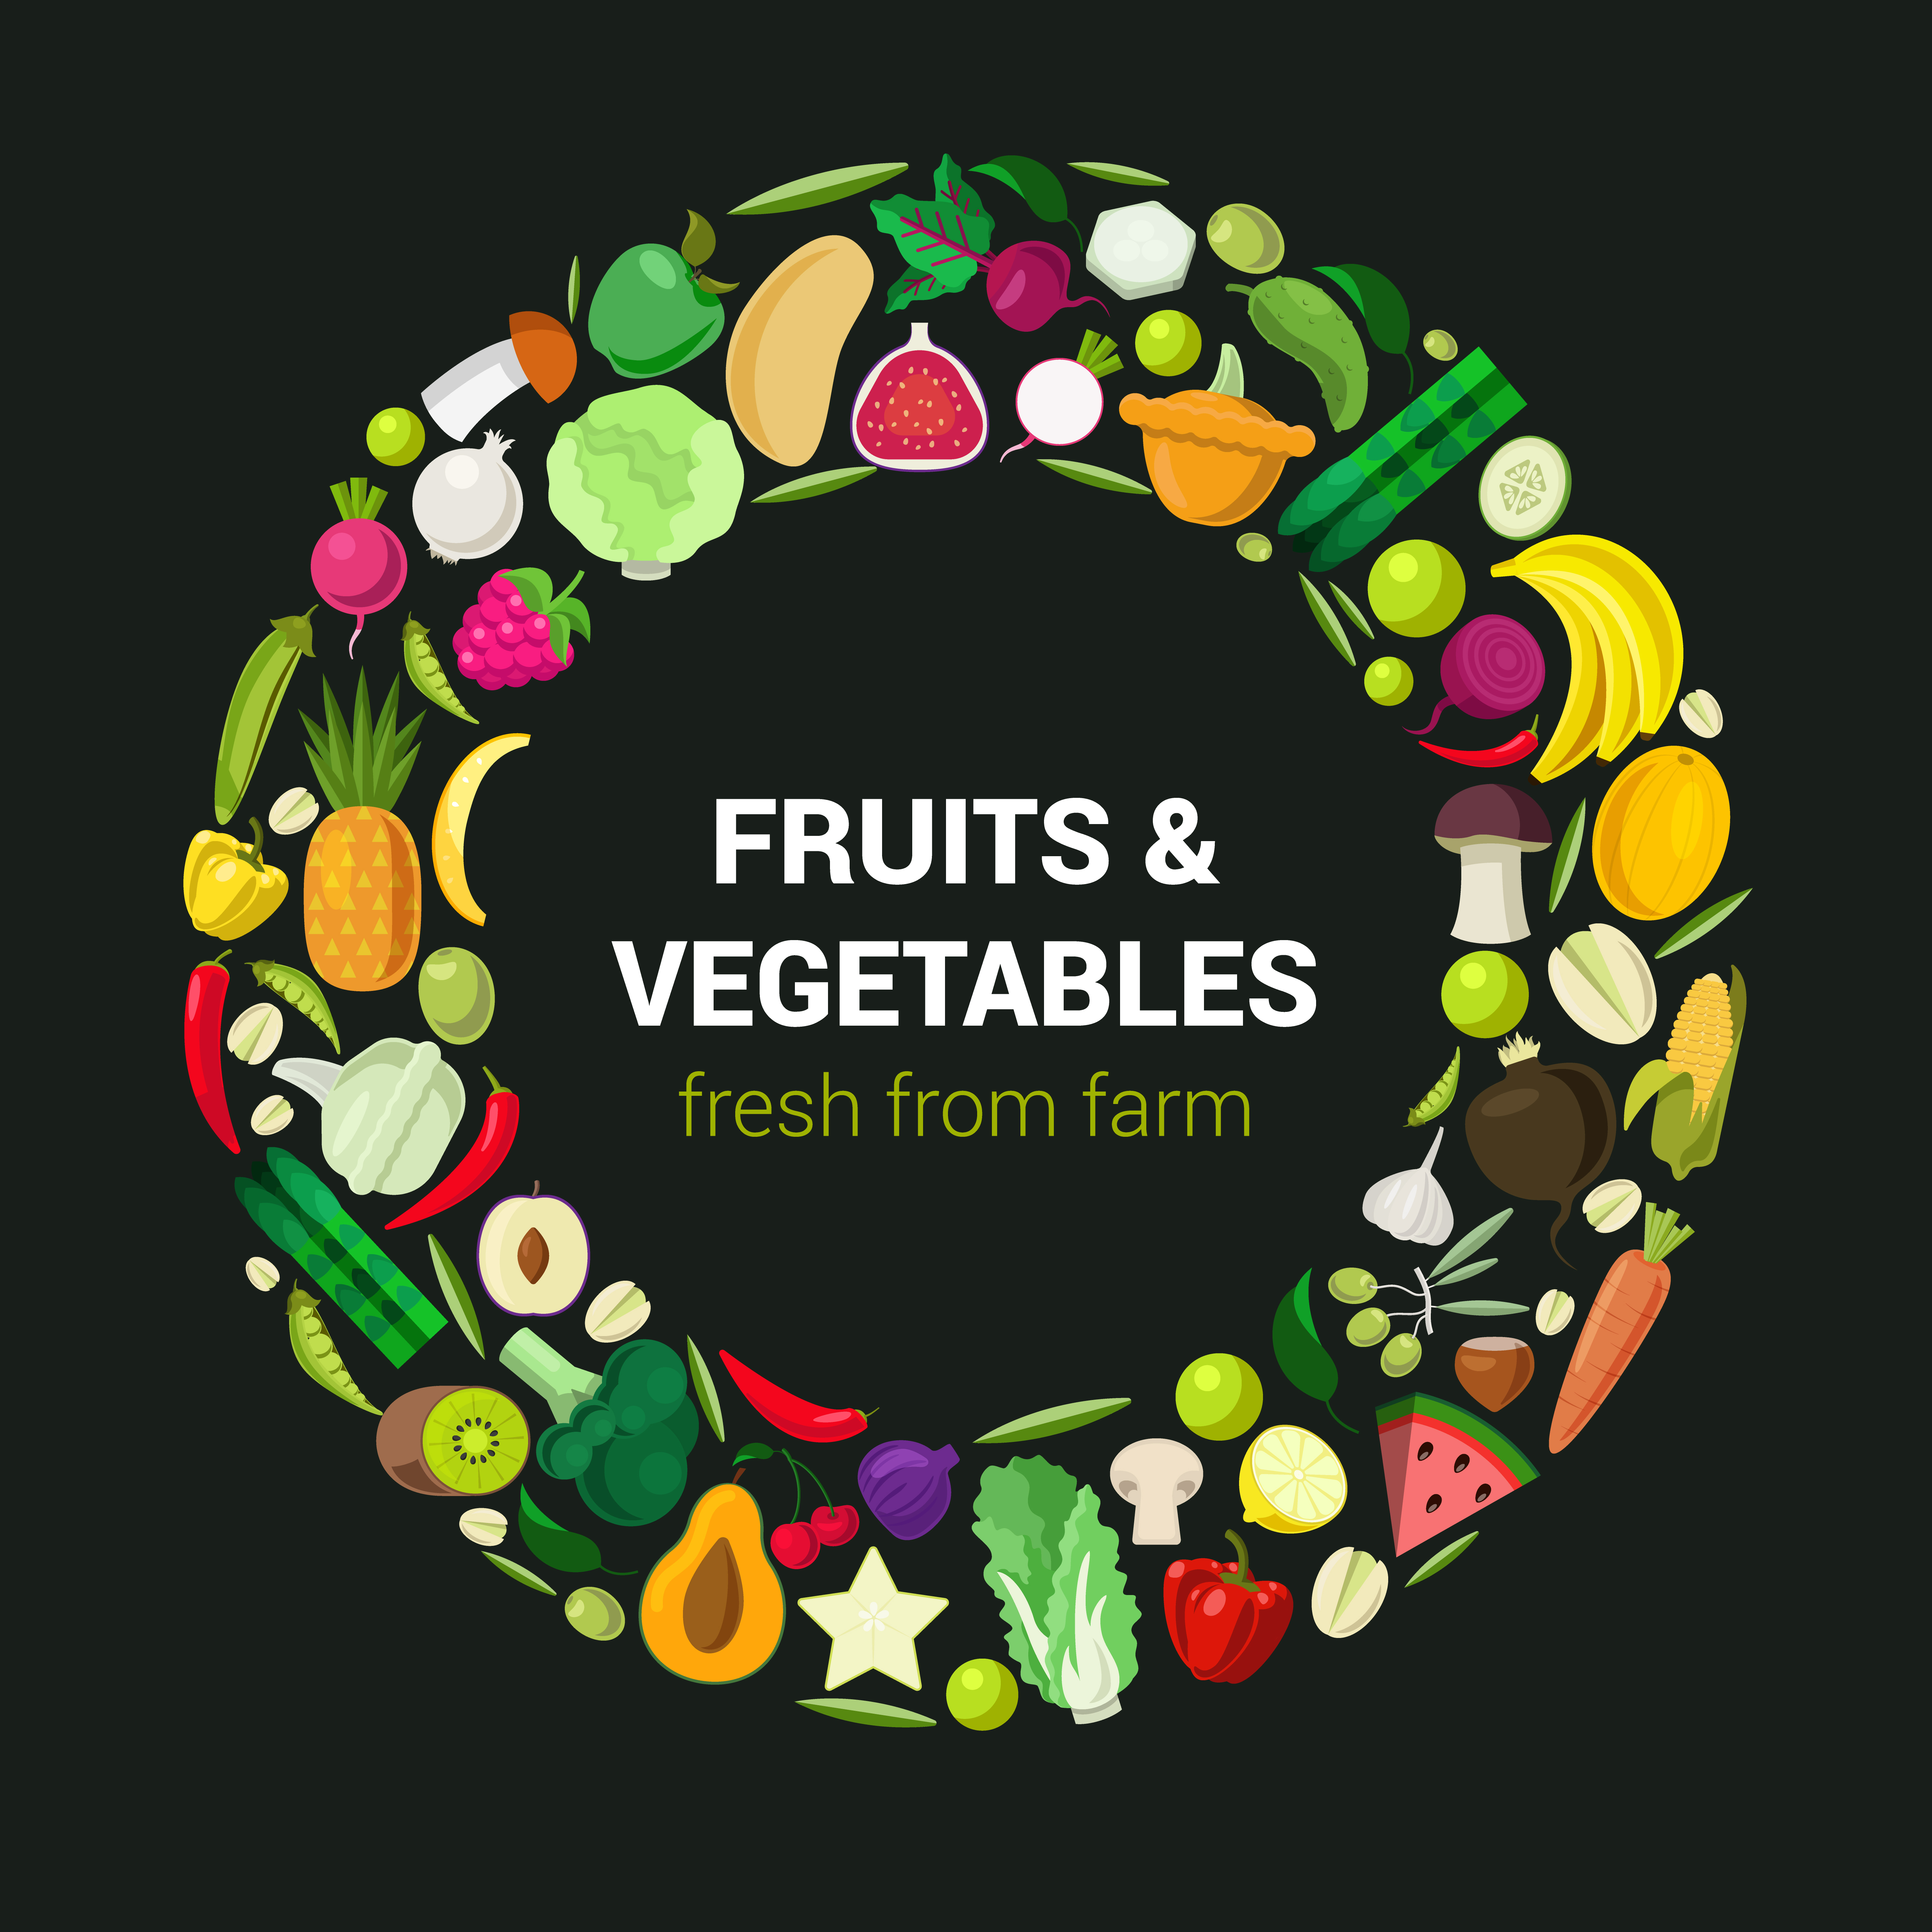 Ring of tasty eco food icons. Stylish fresh icon set fruit vegetable berry mushroom plants concept. Farm food collection.